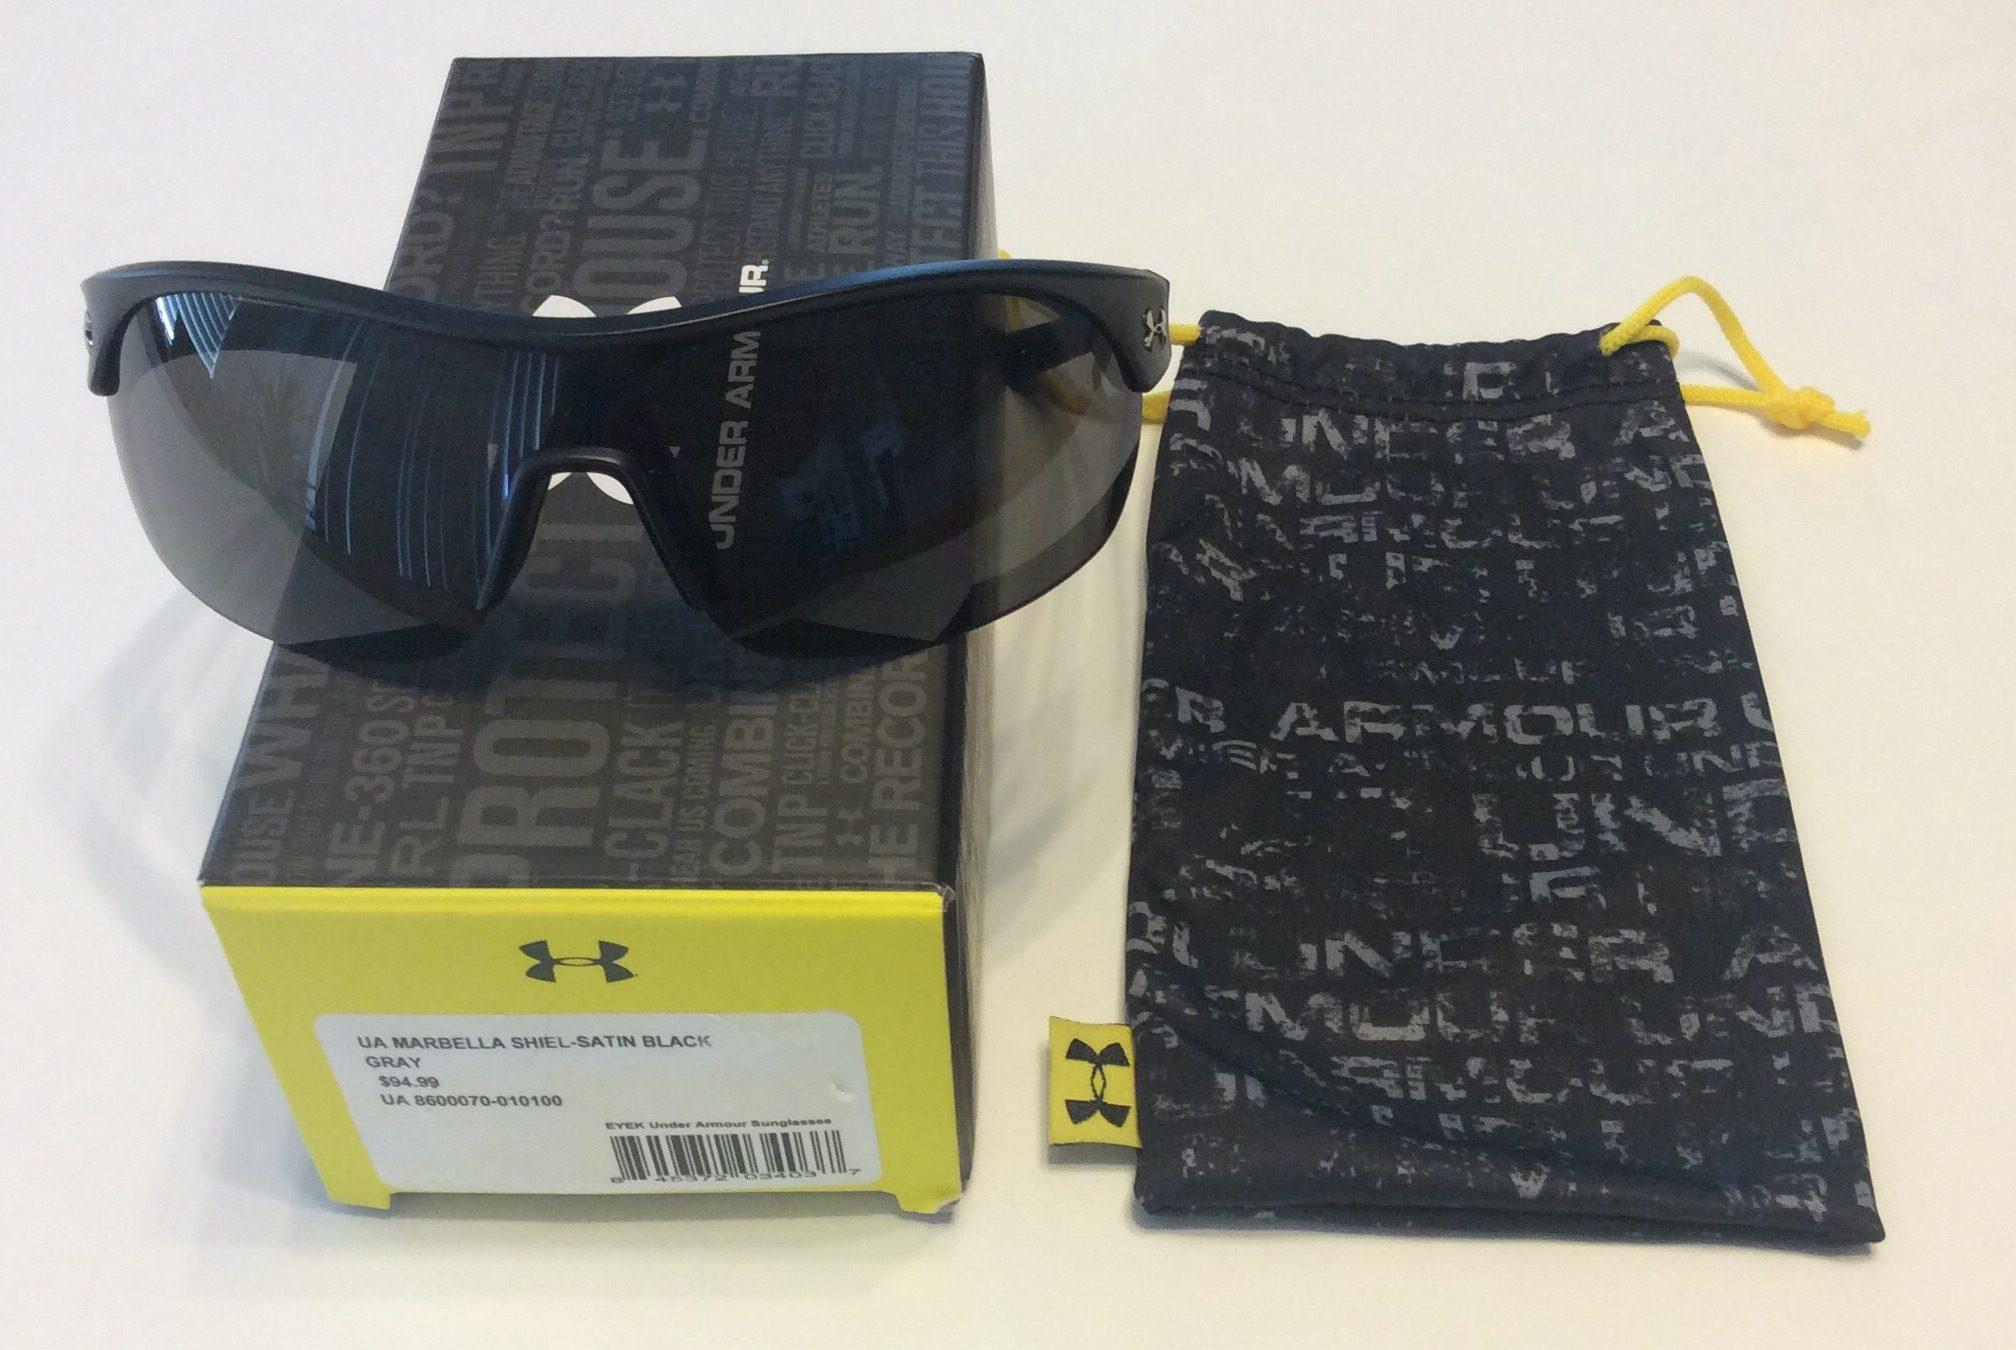 7a64f42ea3 Under Armour Impulse Polarized Sunglasses Black